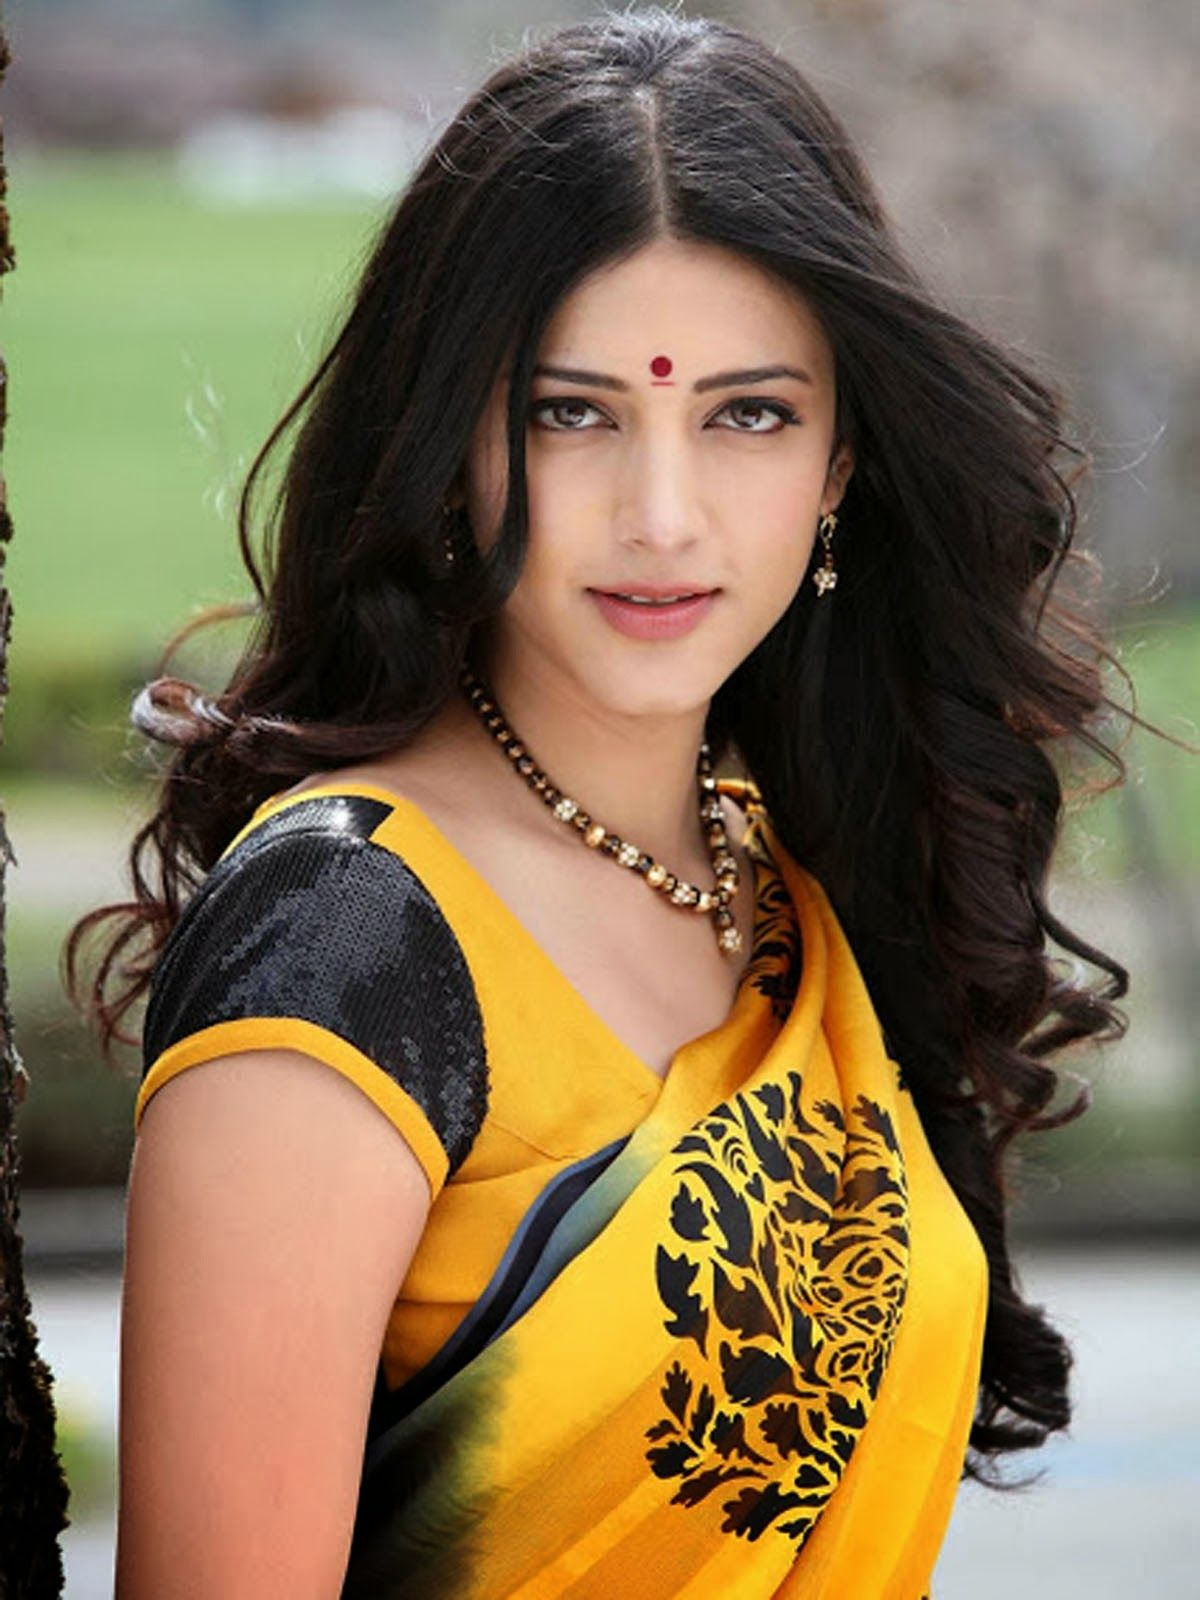 Download Actress Shruthi Hassan Cute Hd Wallpapers Wallpaper Hd Free Uploaded By Pankaj Wallpa Shruti Hassan Indian Actress Photos Beautiful Indian Actress